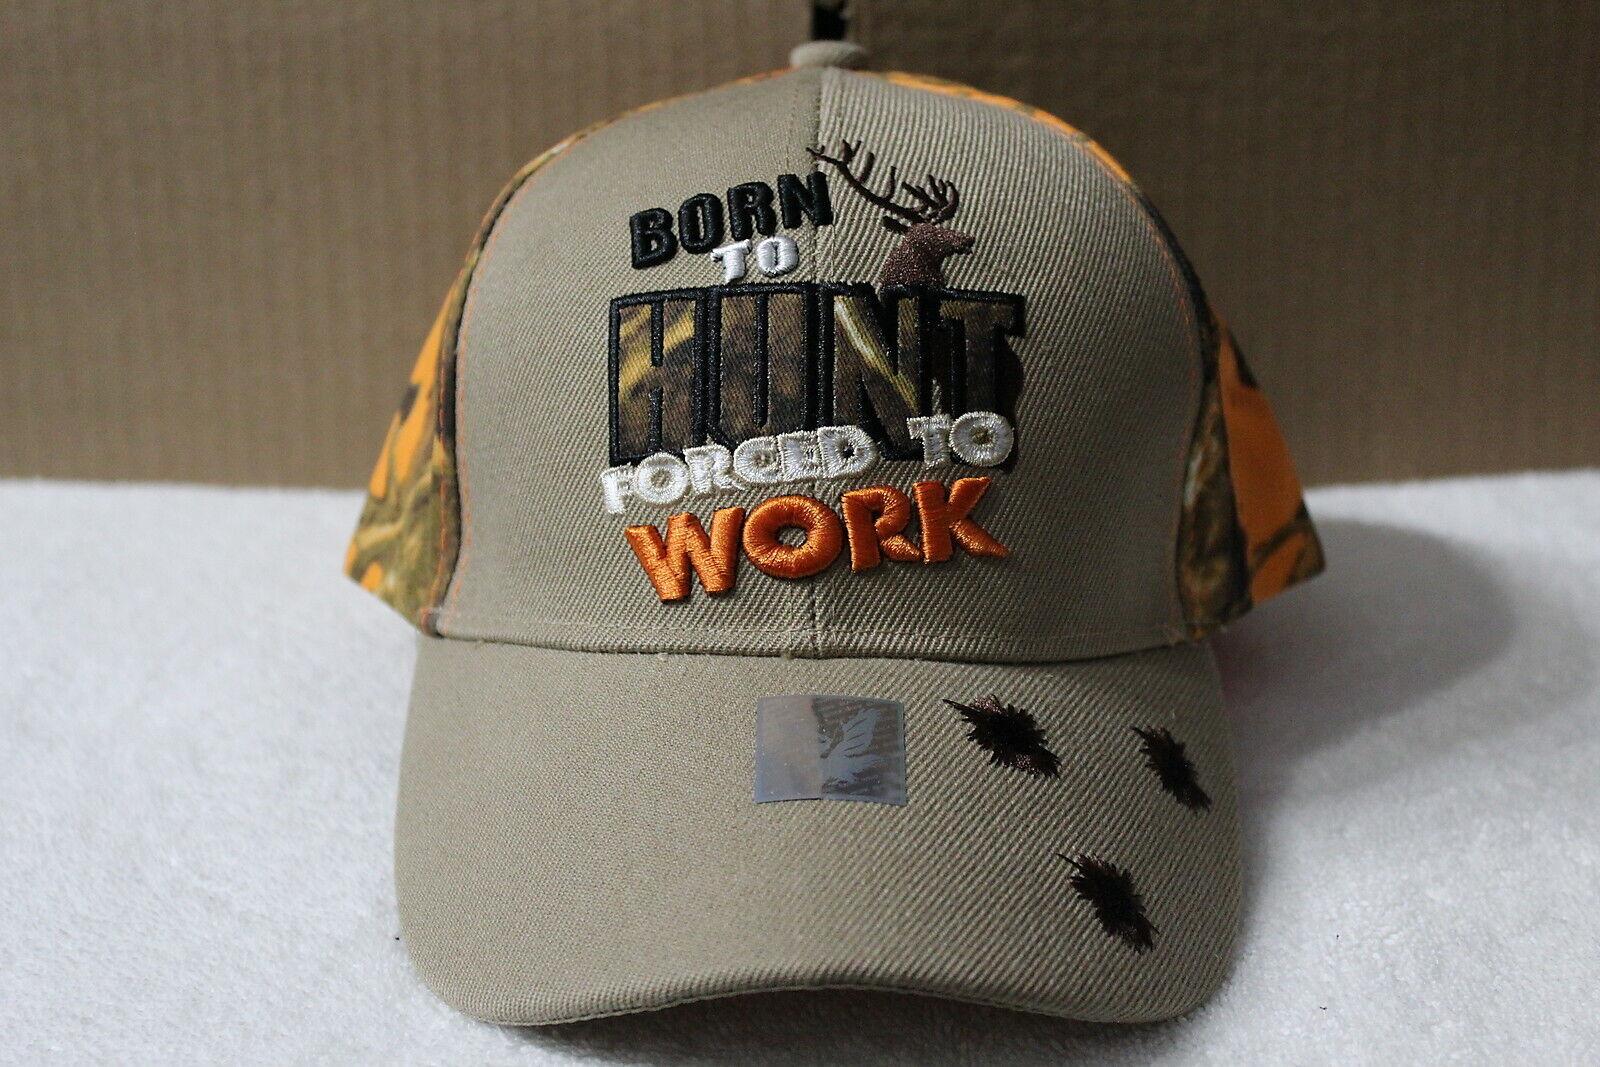 CAMO GUNSHOT BULLET HOLE HUNTING IS LIFE ADJUSTABLE HAT hunters baseball cap A80